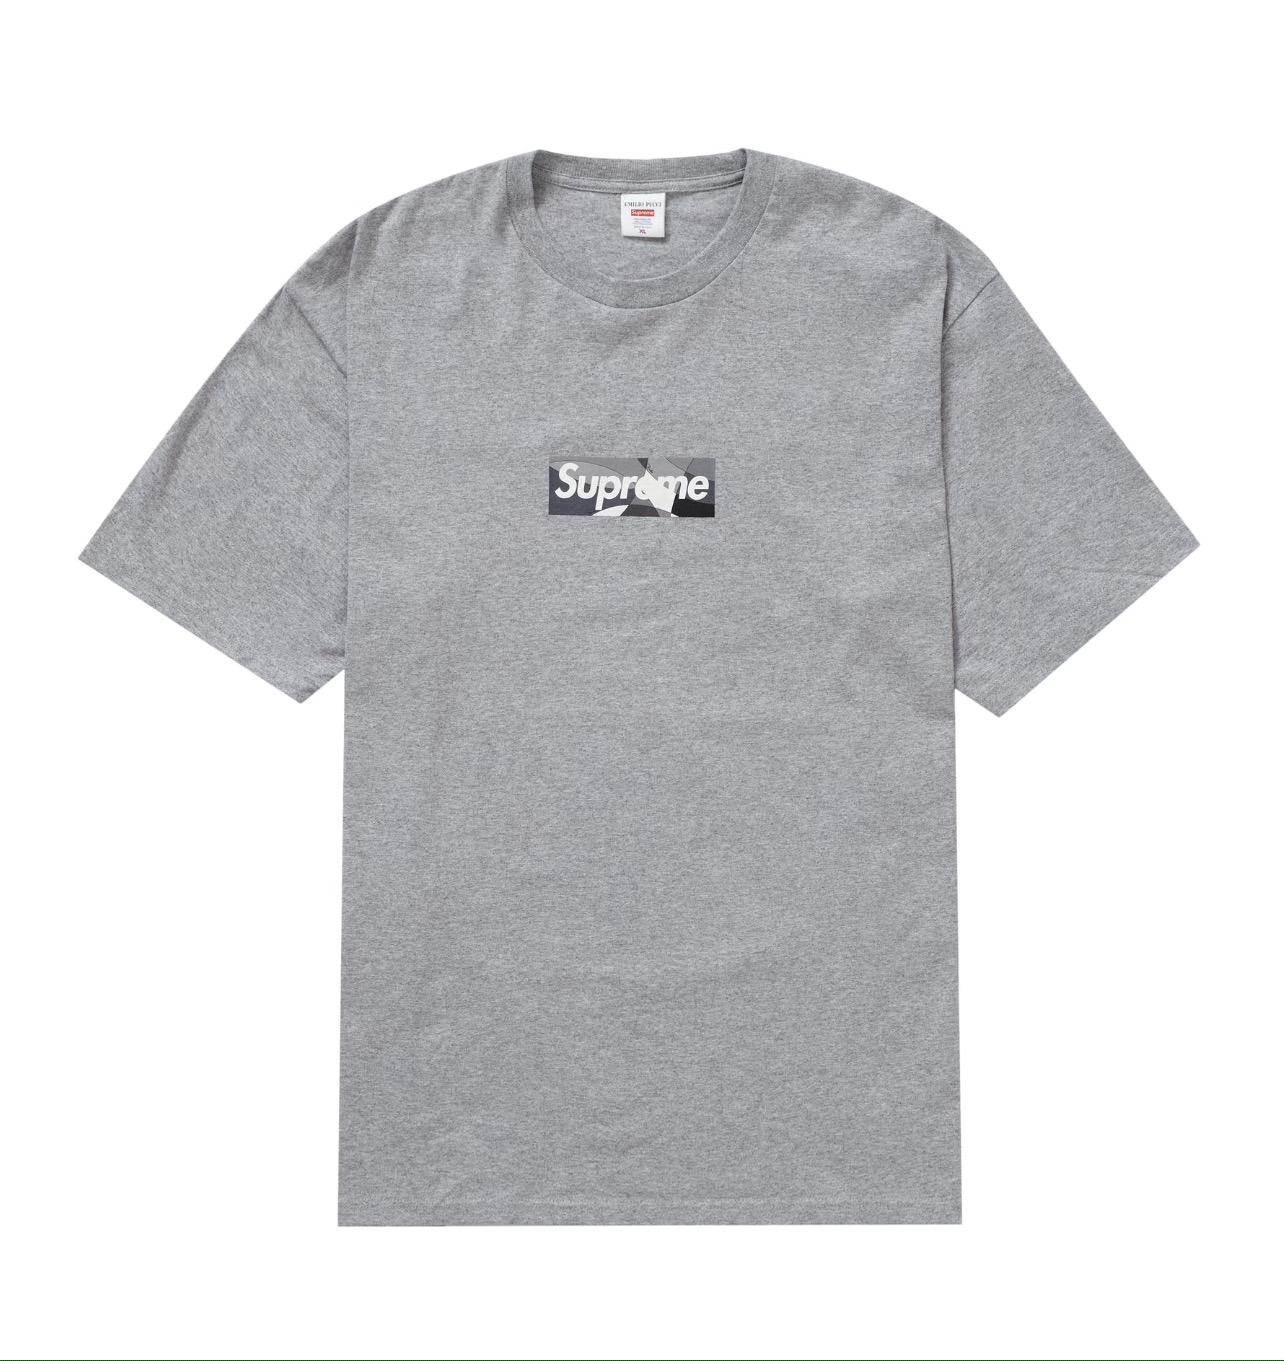 Supreme Emilio Pucci Box Logo Tee Grey Size M